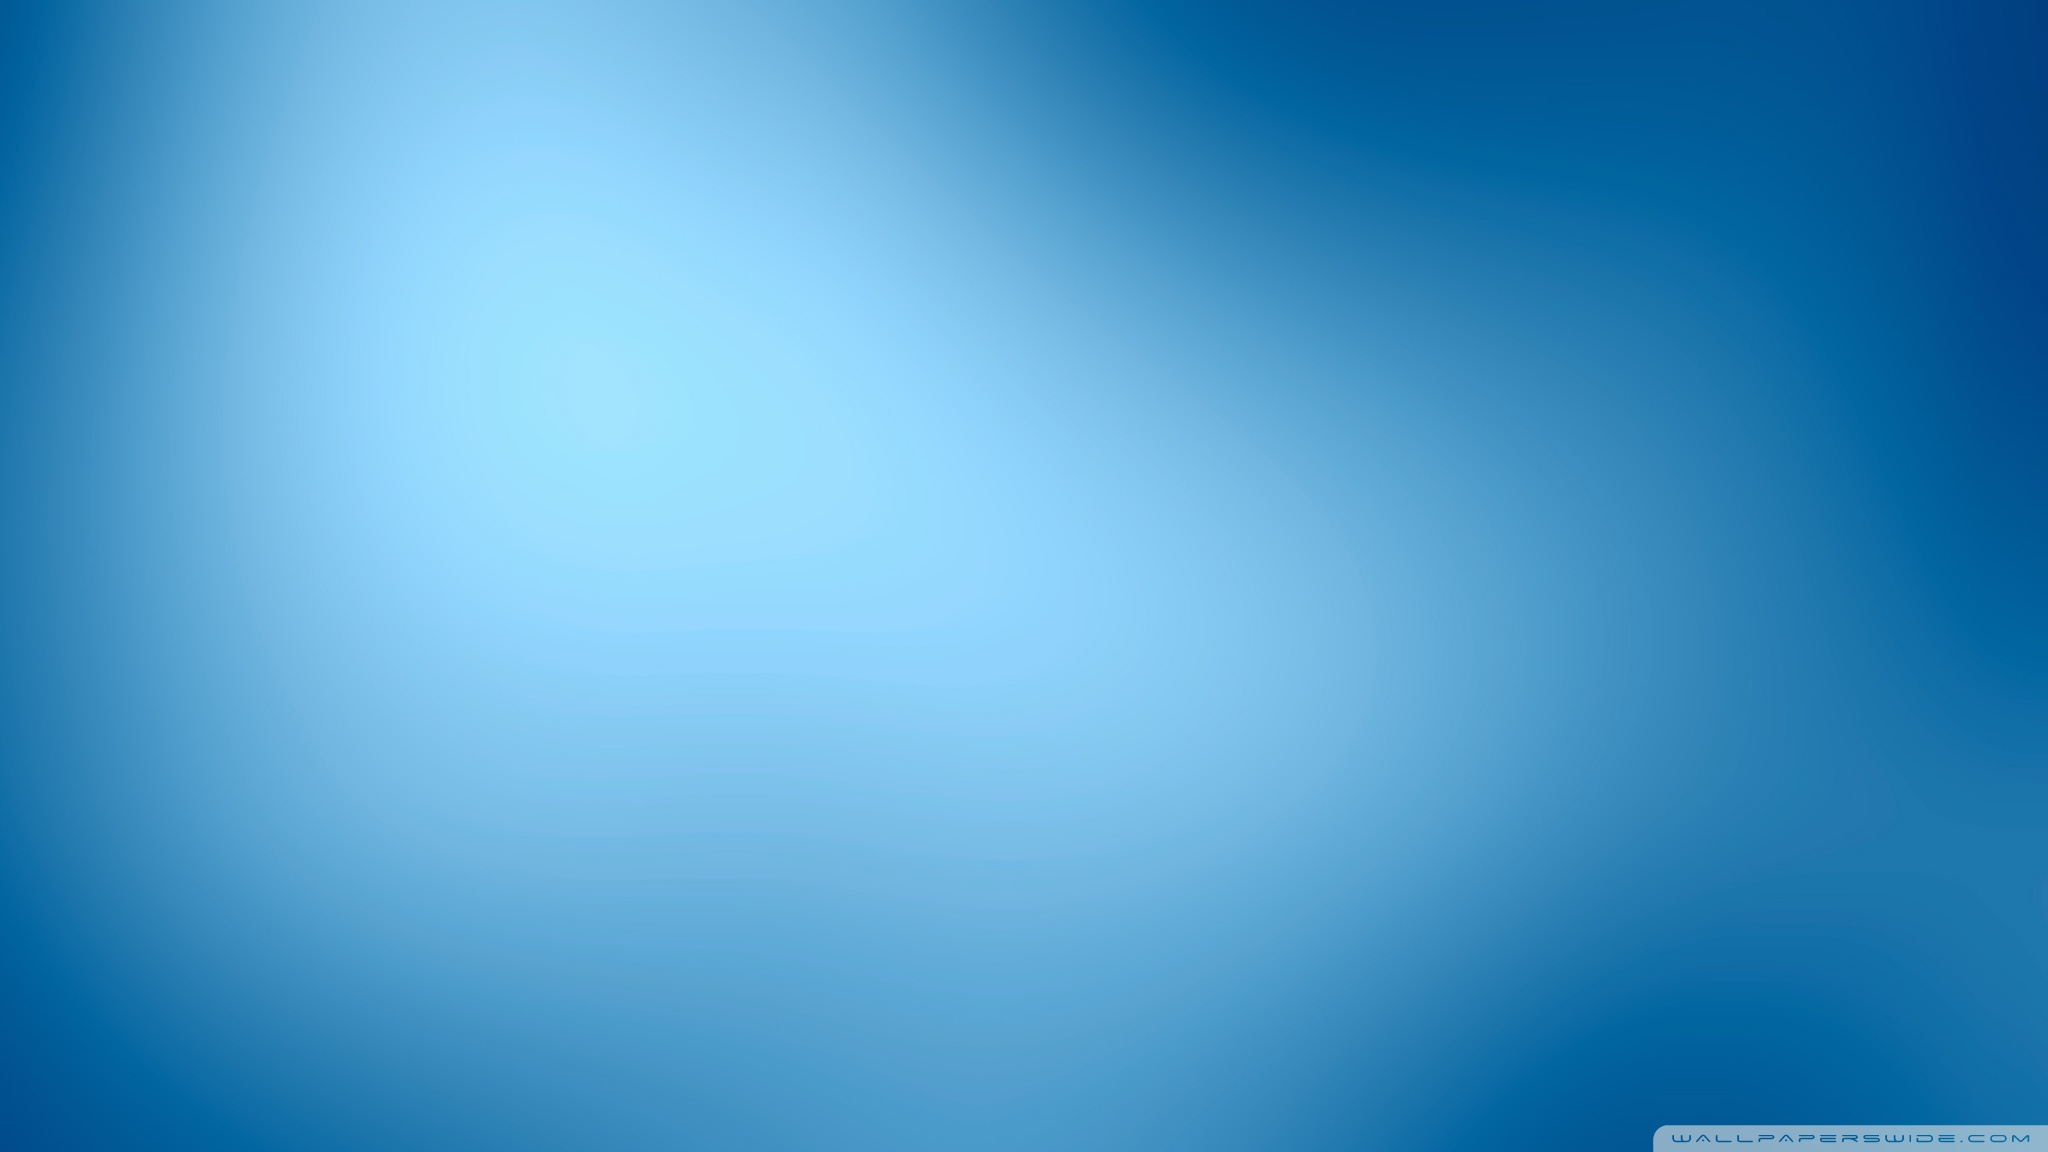 2048 pixels wide 1152 pixels tall best desktop background Success 2048x1152